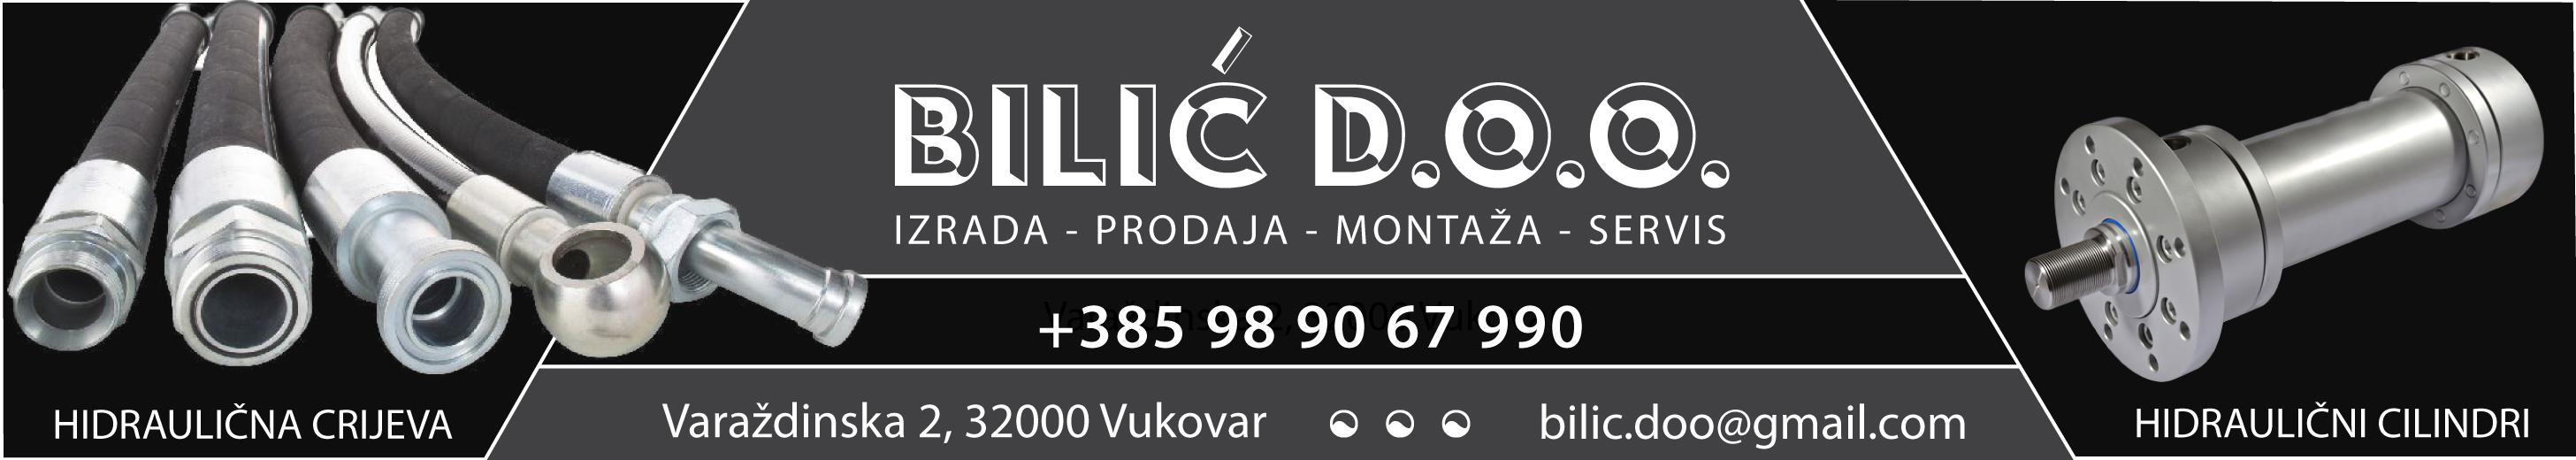 BILIĆ-doo@4x